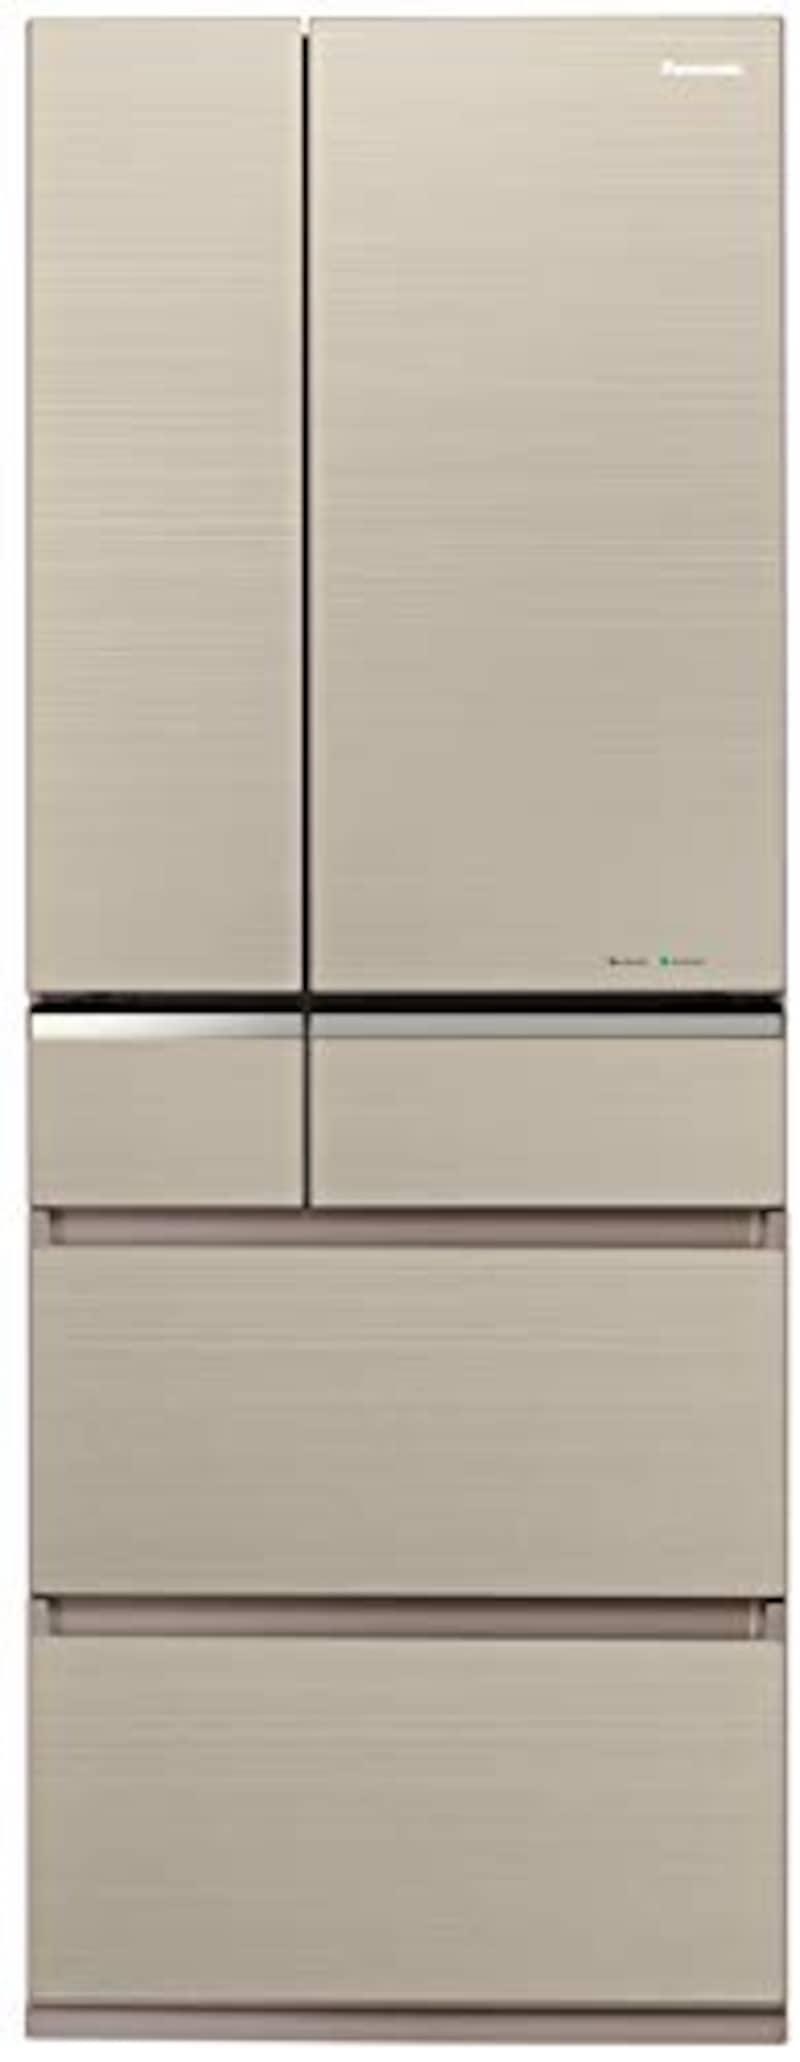 Panasonic(パナソニック),冷蔵庫 6ドア 501L,NR-F505XPV-N